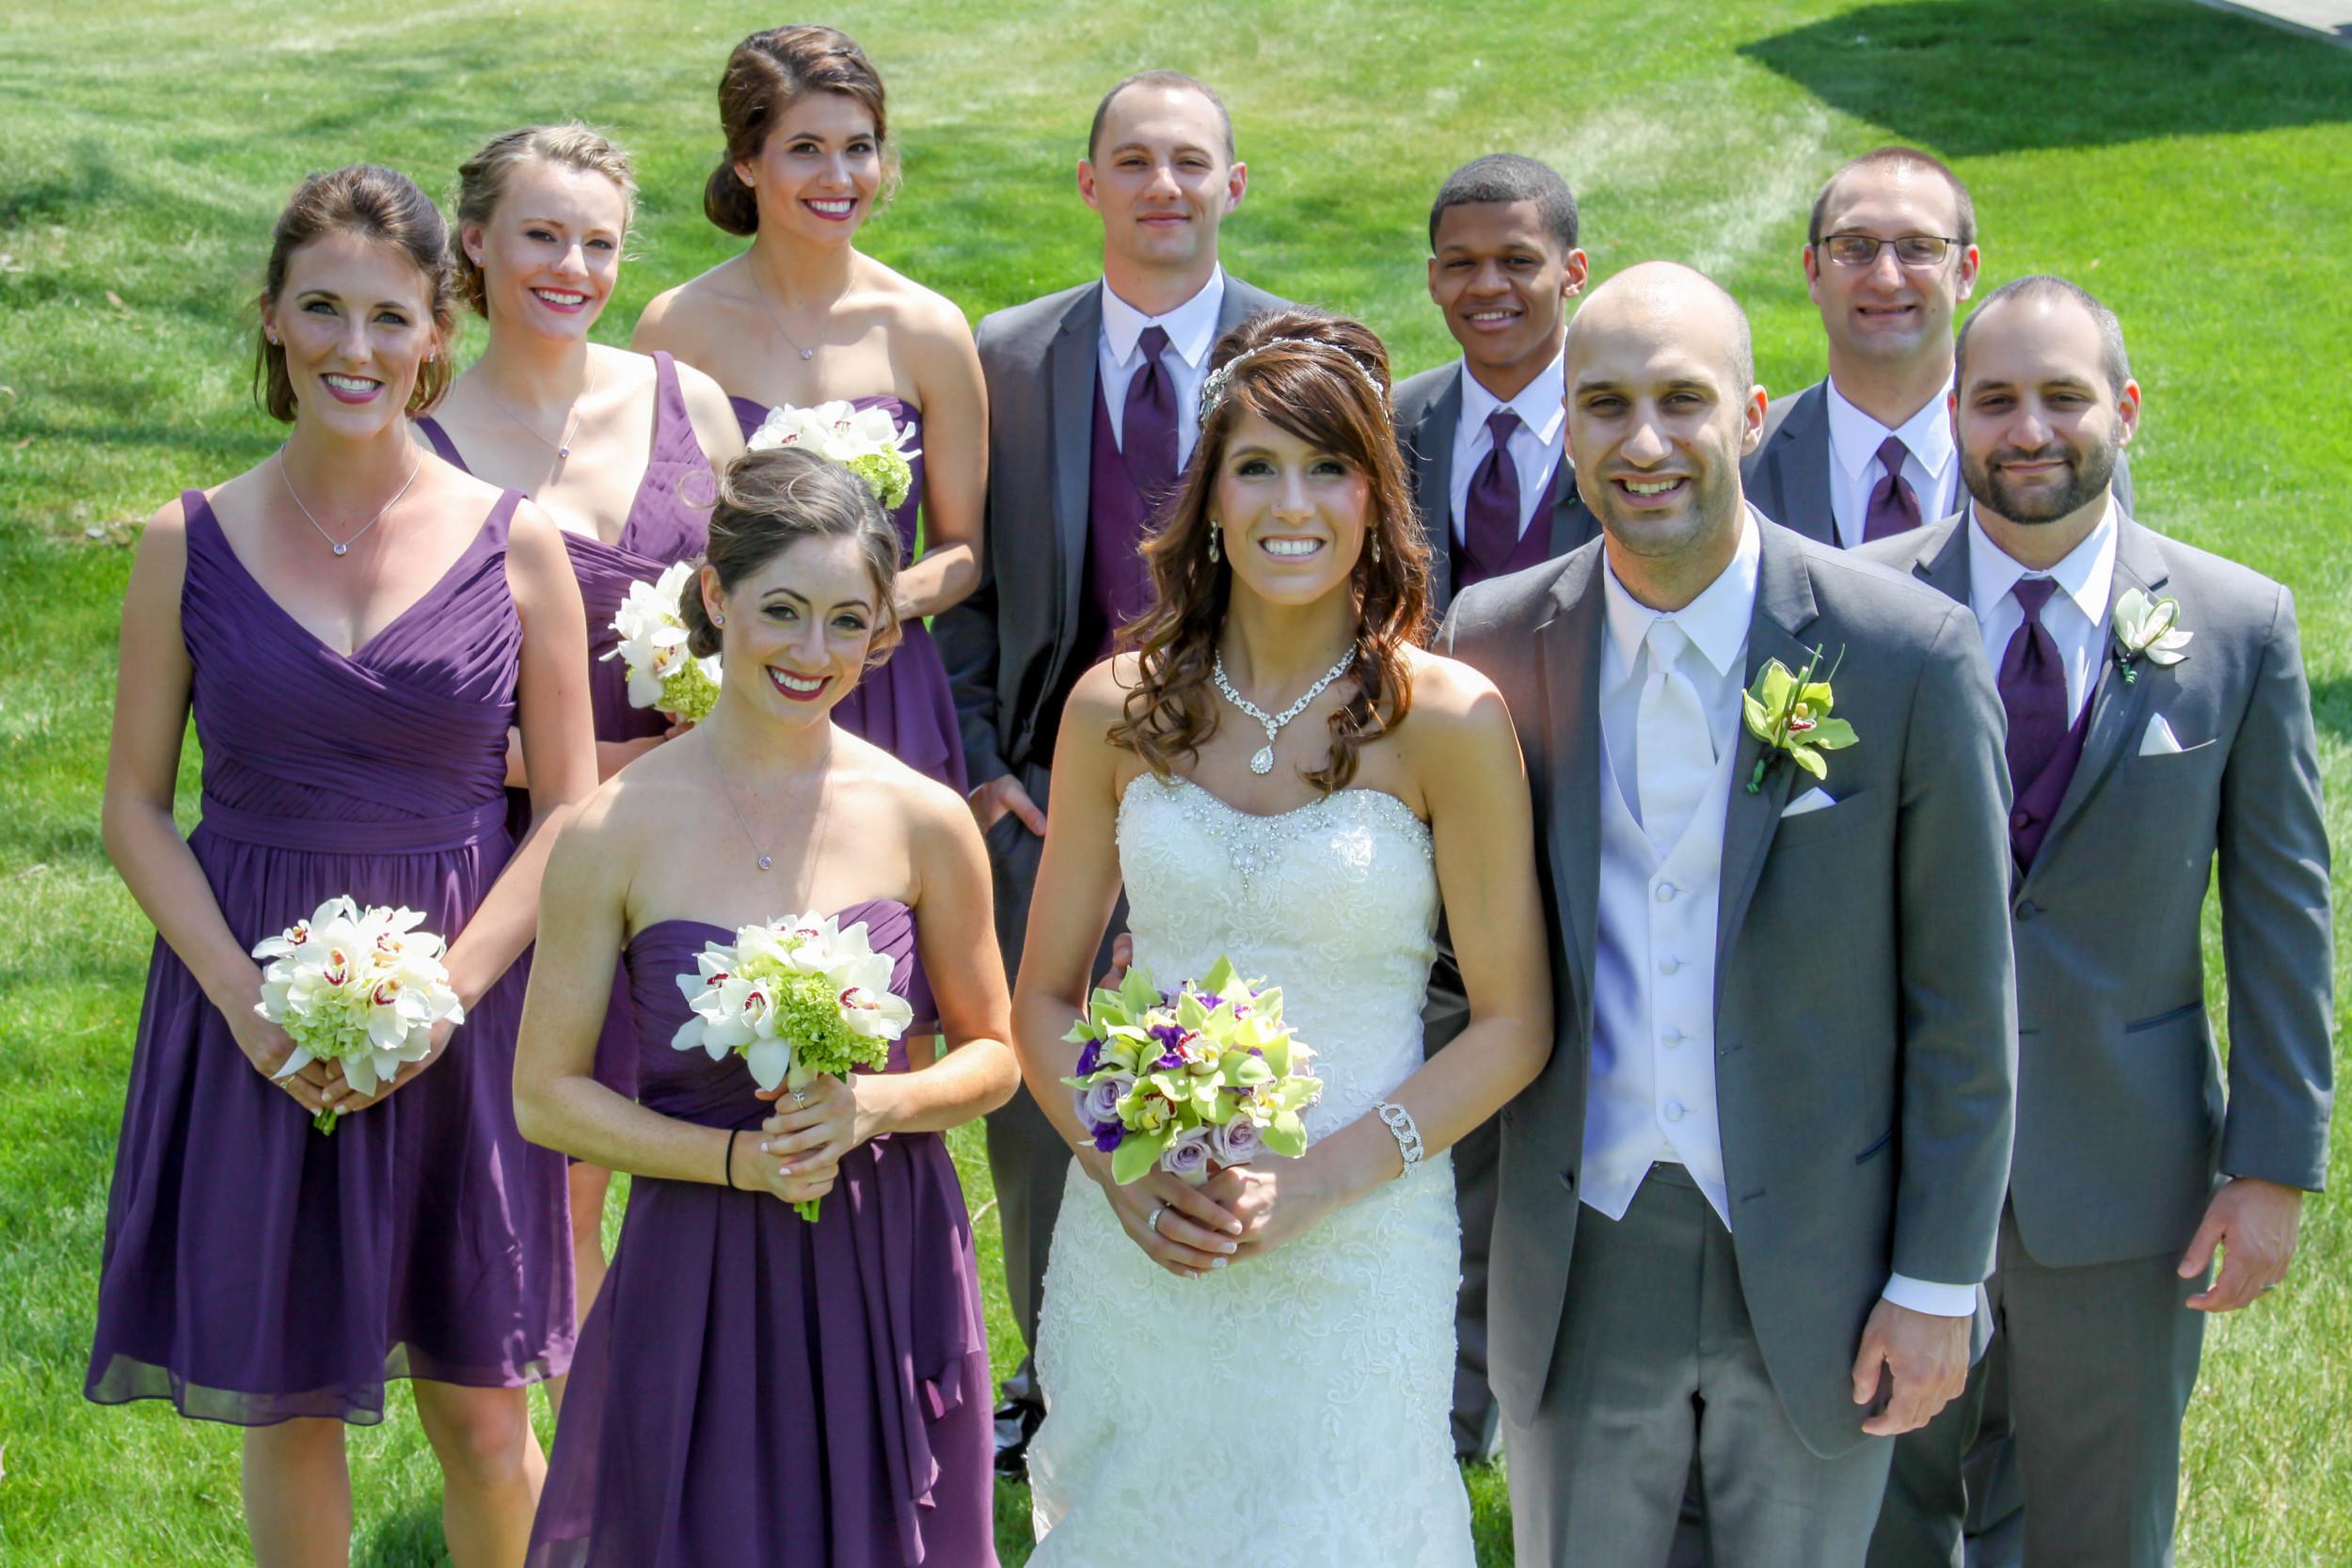 Nice, well lit wedding group photo